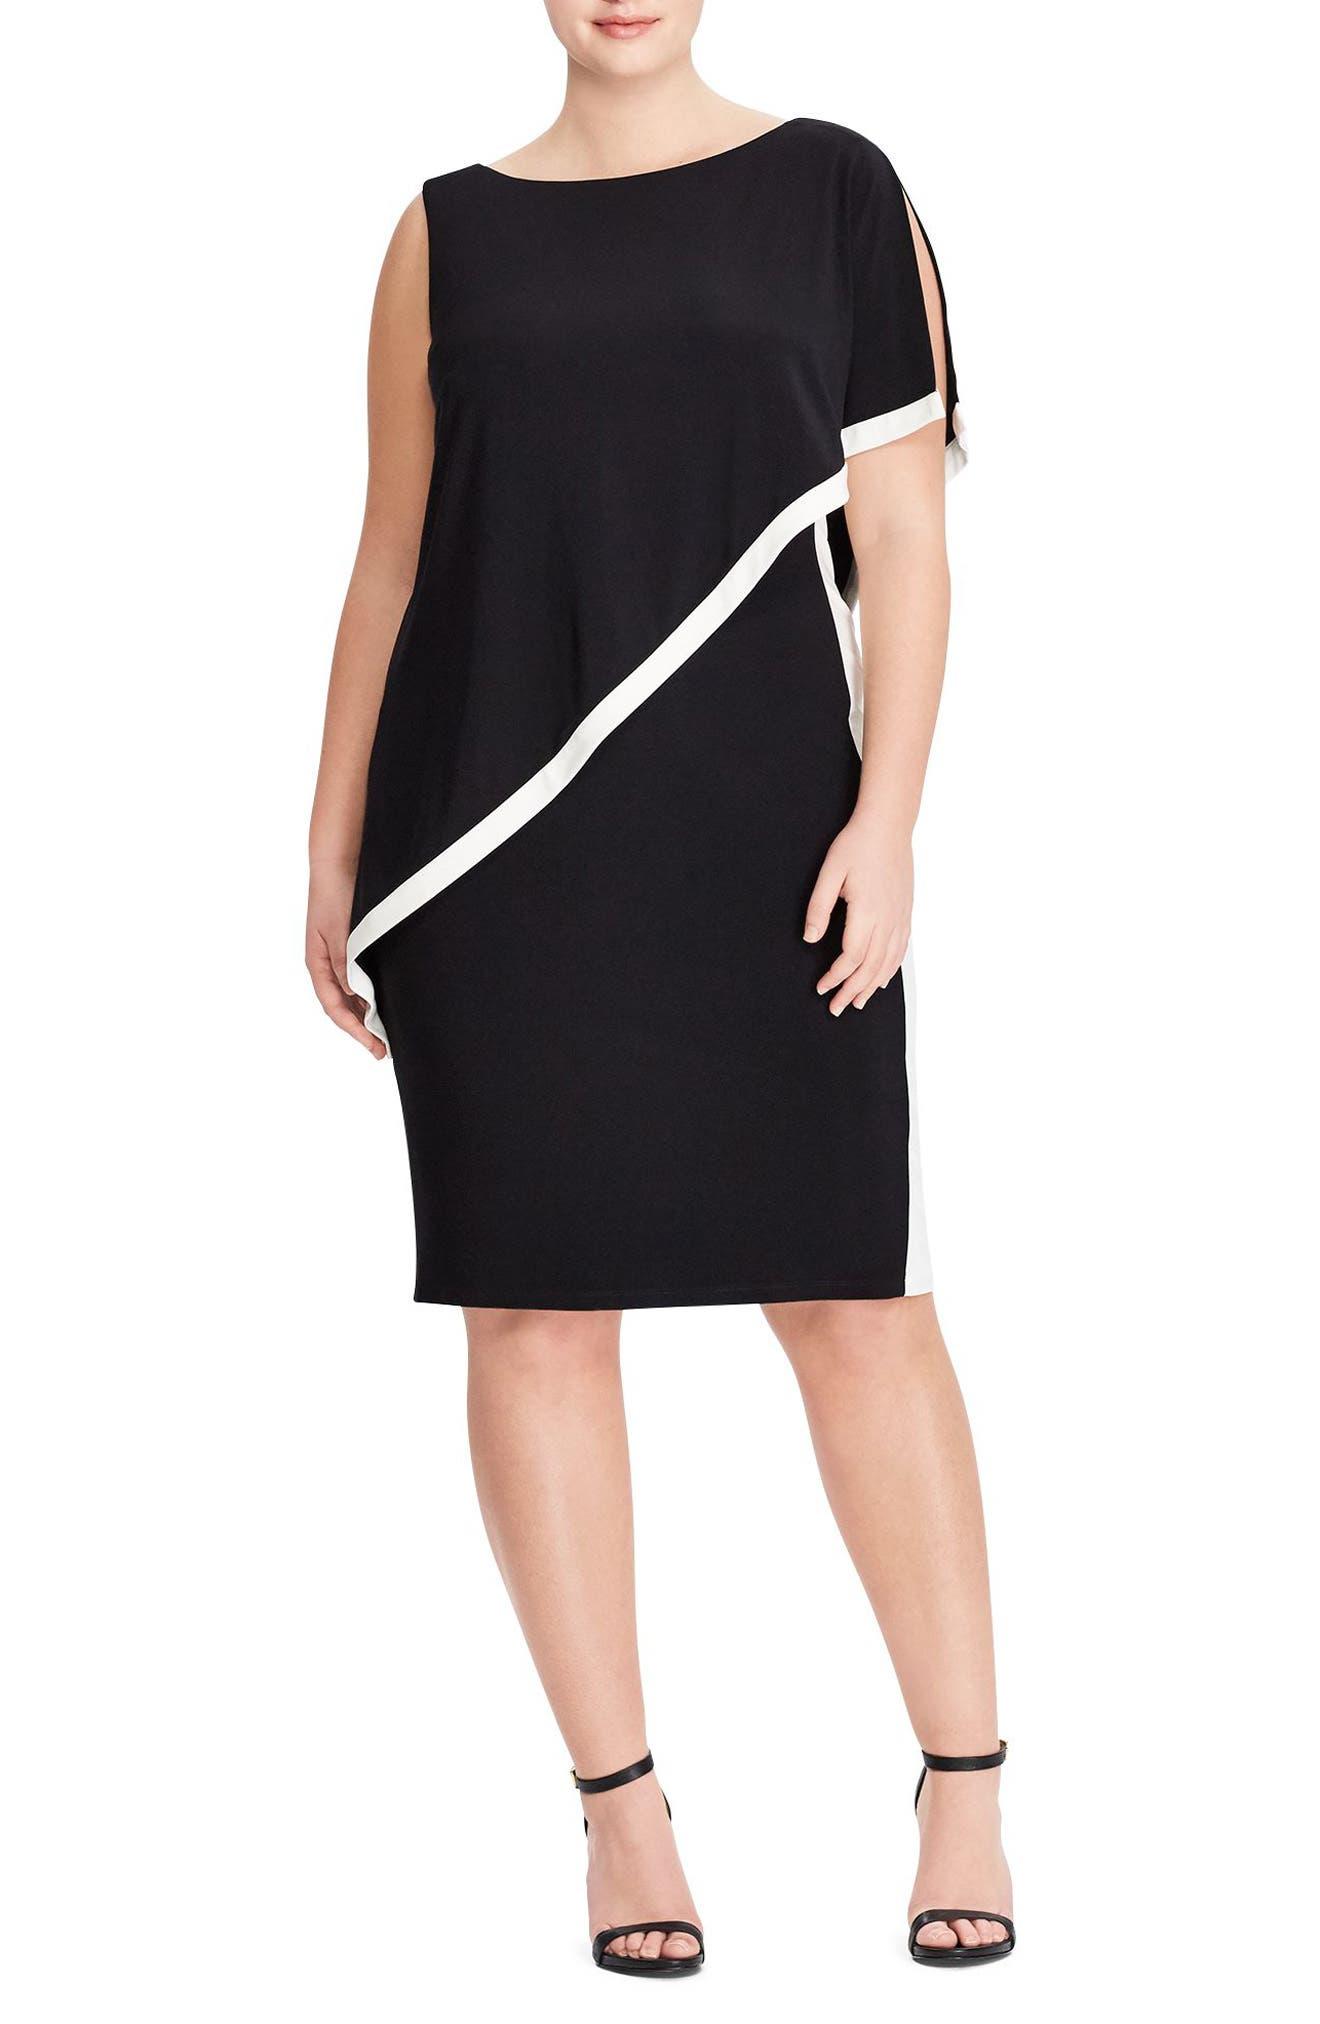 Cape Overlay Sheath Dress,                         Main,                         color, Black-Lauren White